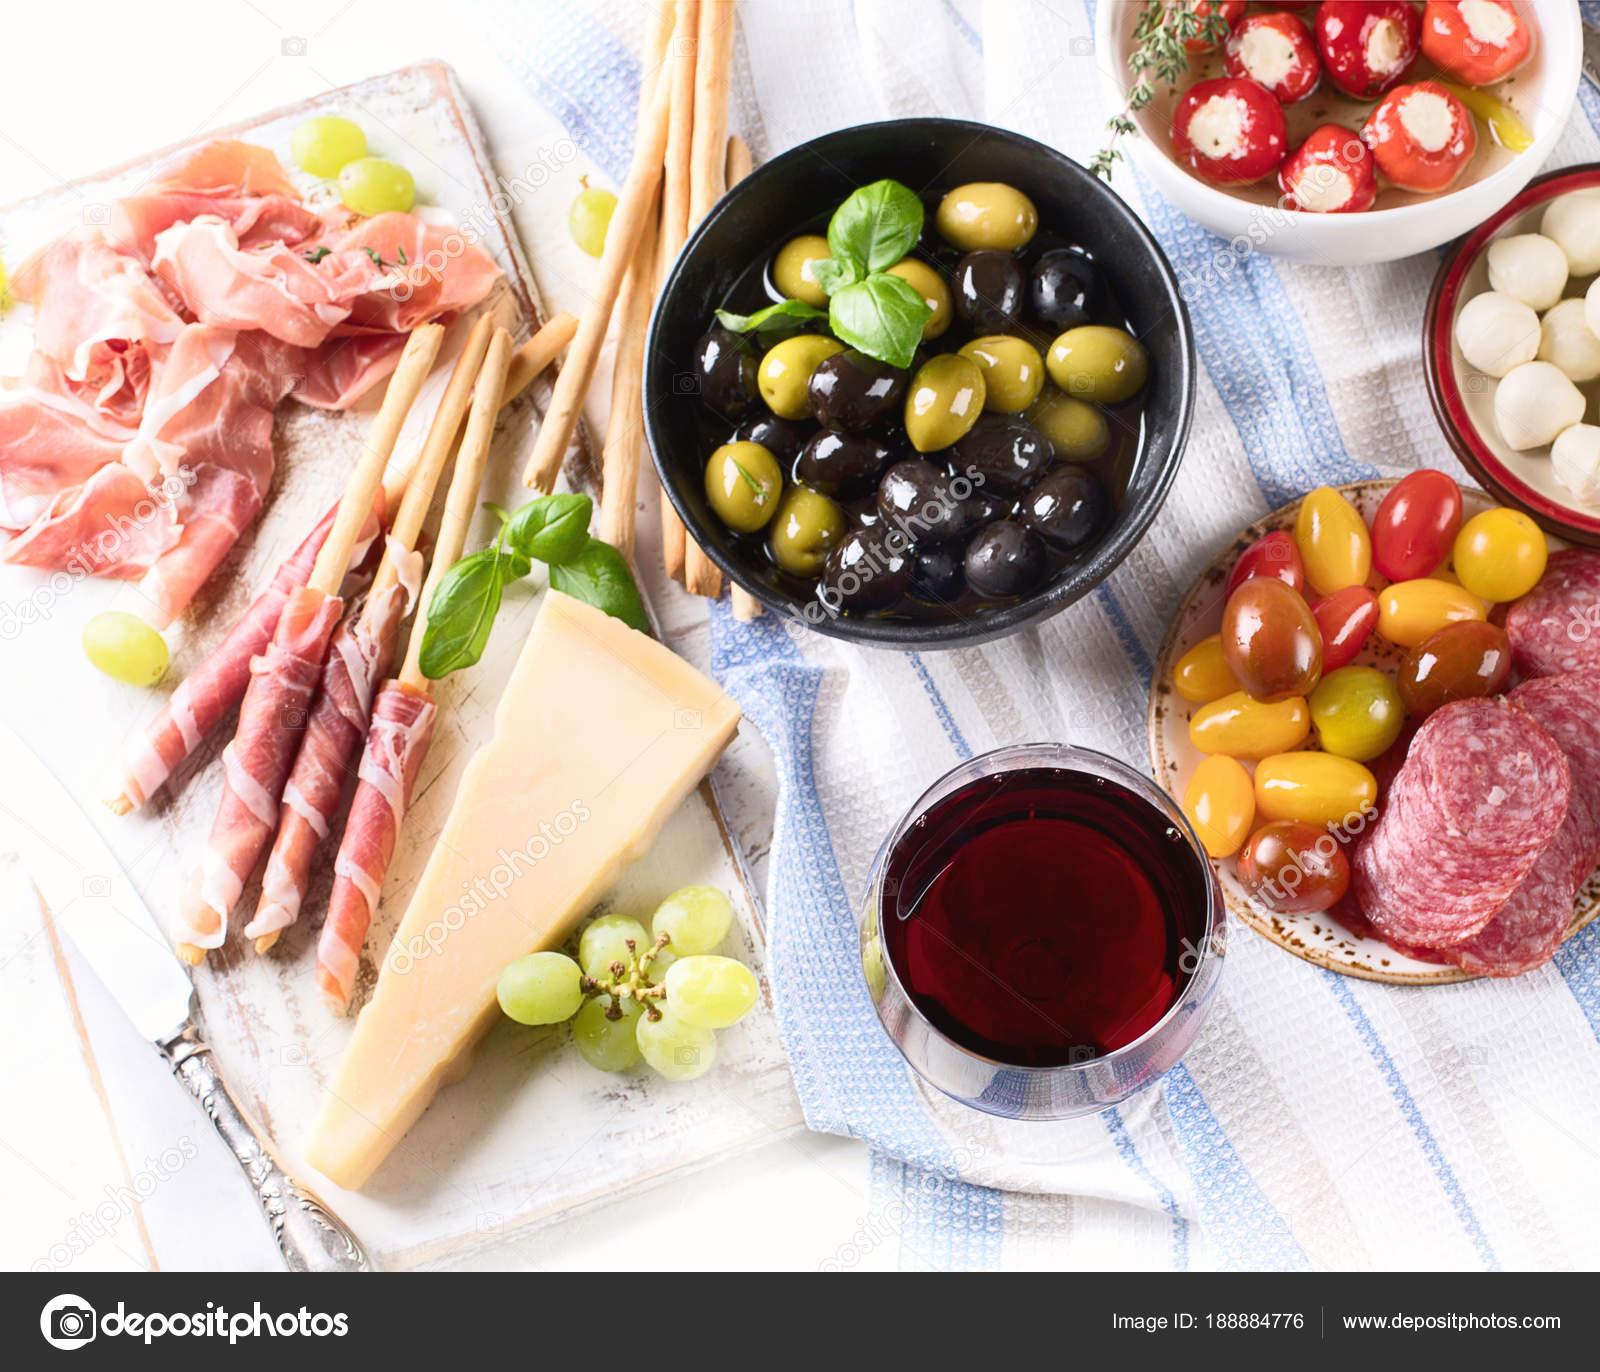 Typical Italian Antipasto Mixed Antipasto Platter Traditional Italian Food Stock Photo C Bit245 188884776